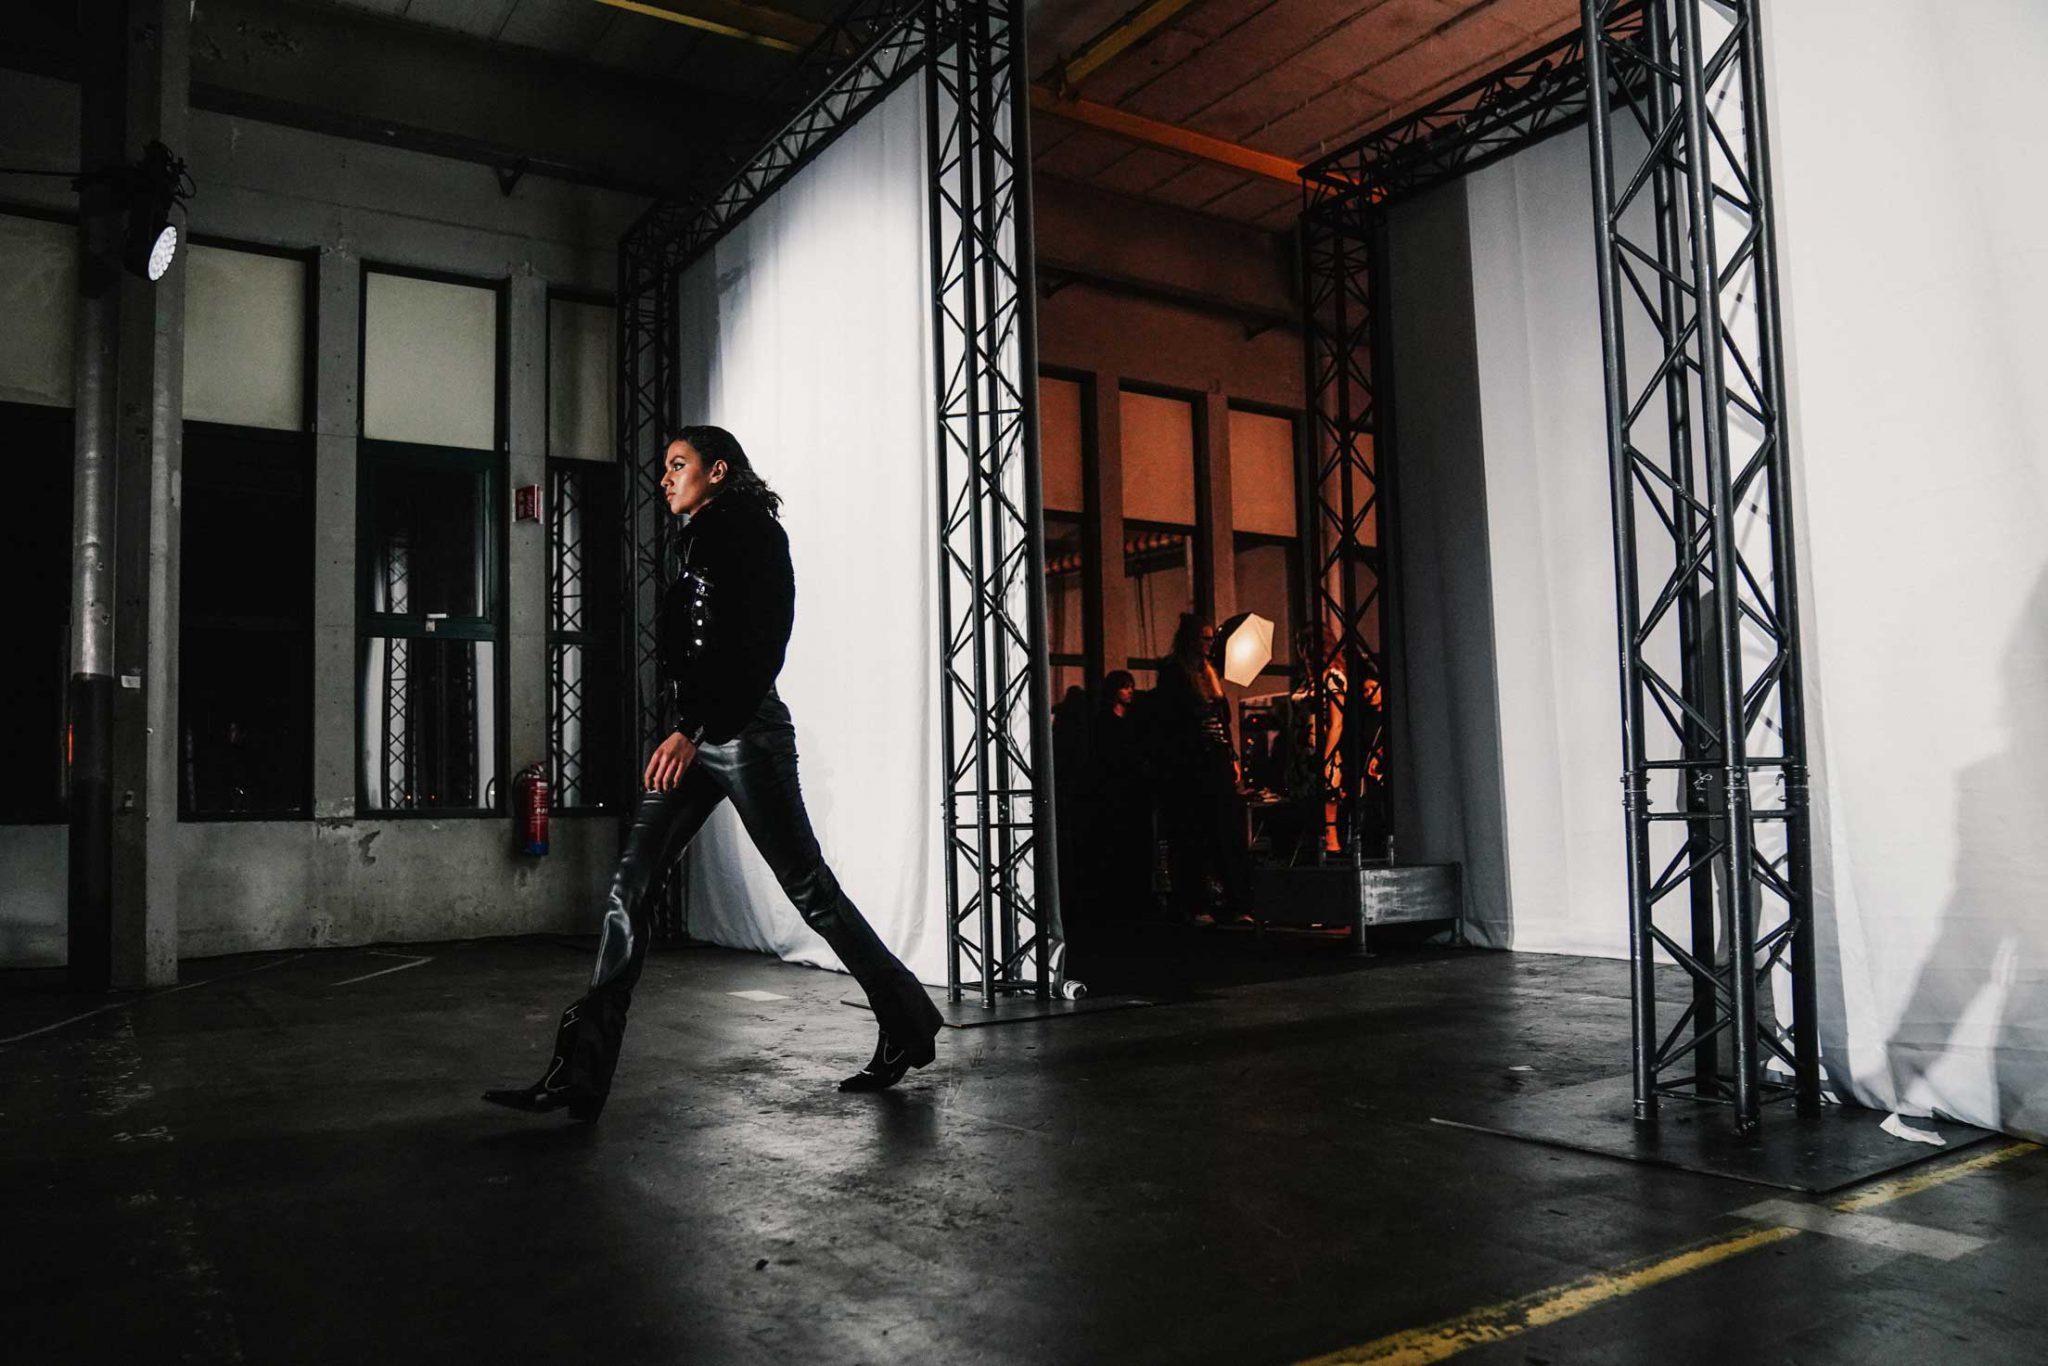 Ilsoo_van_Dijk_Ilsoovandijk_AFW_Toral_Backstage_Amsterdam_Fashion_week_2020_-scaled_17f